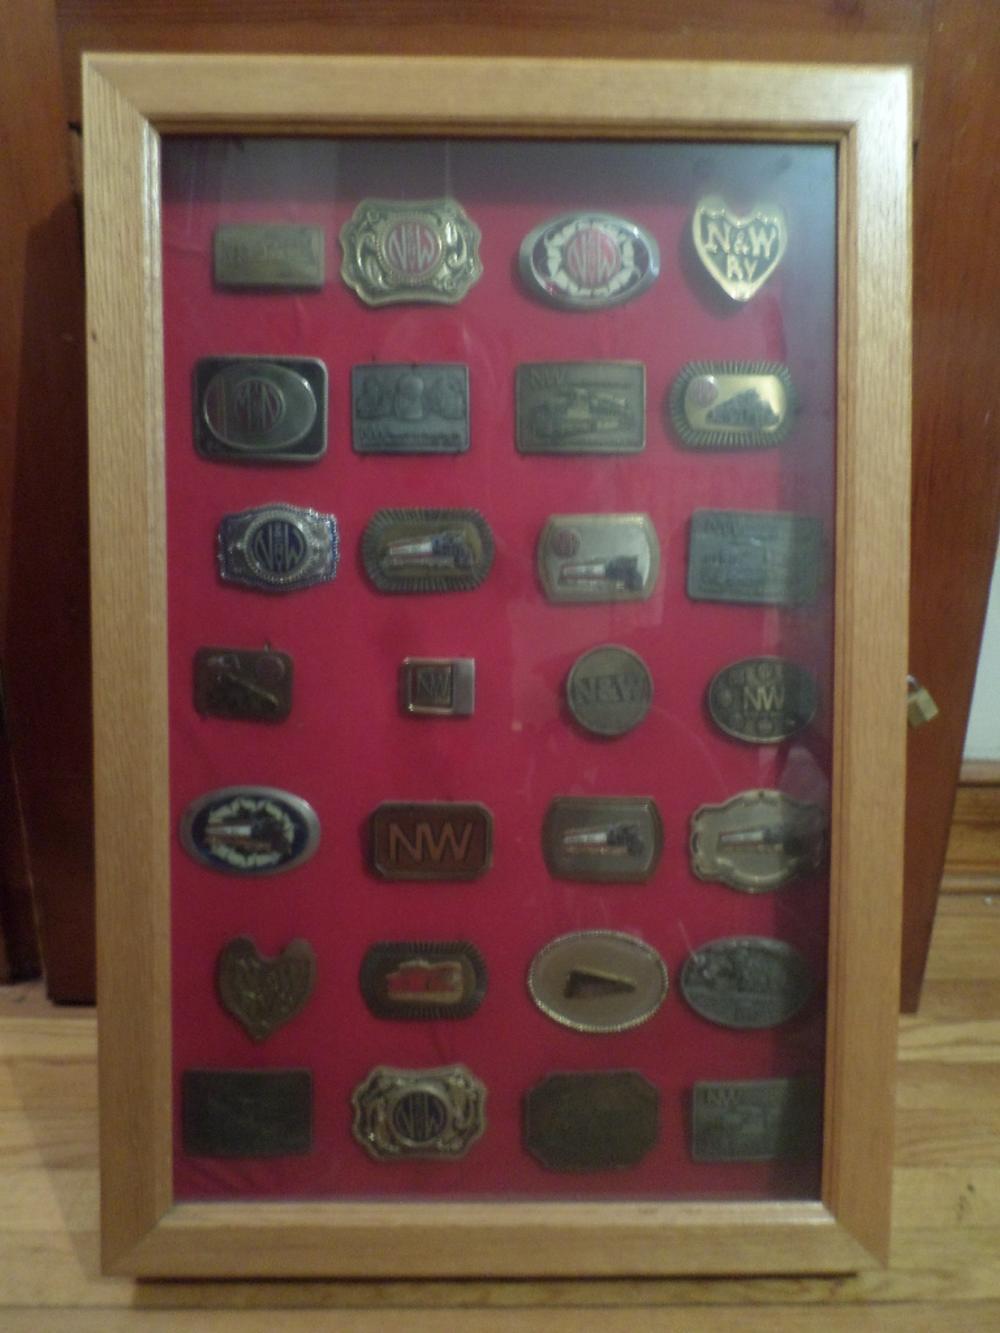 22 N & W Belt Buckles in Presentation Case